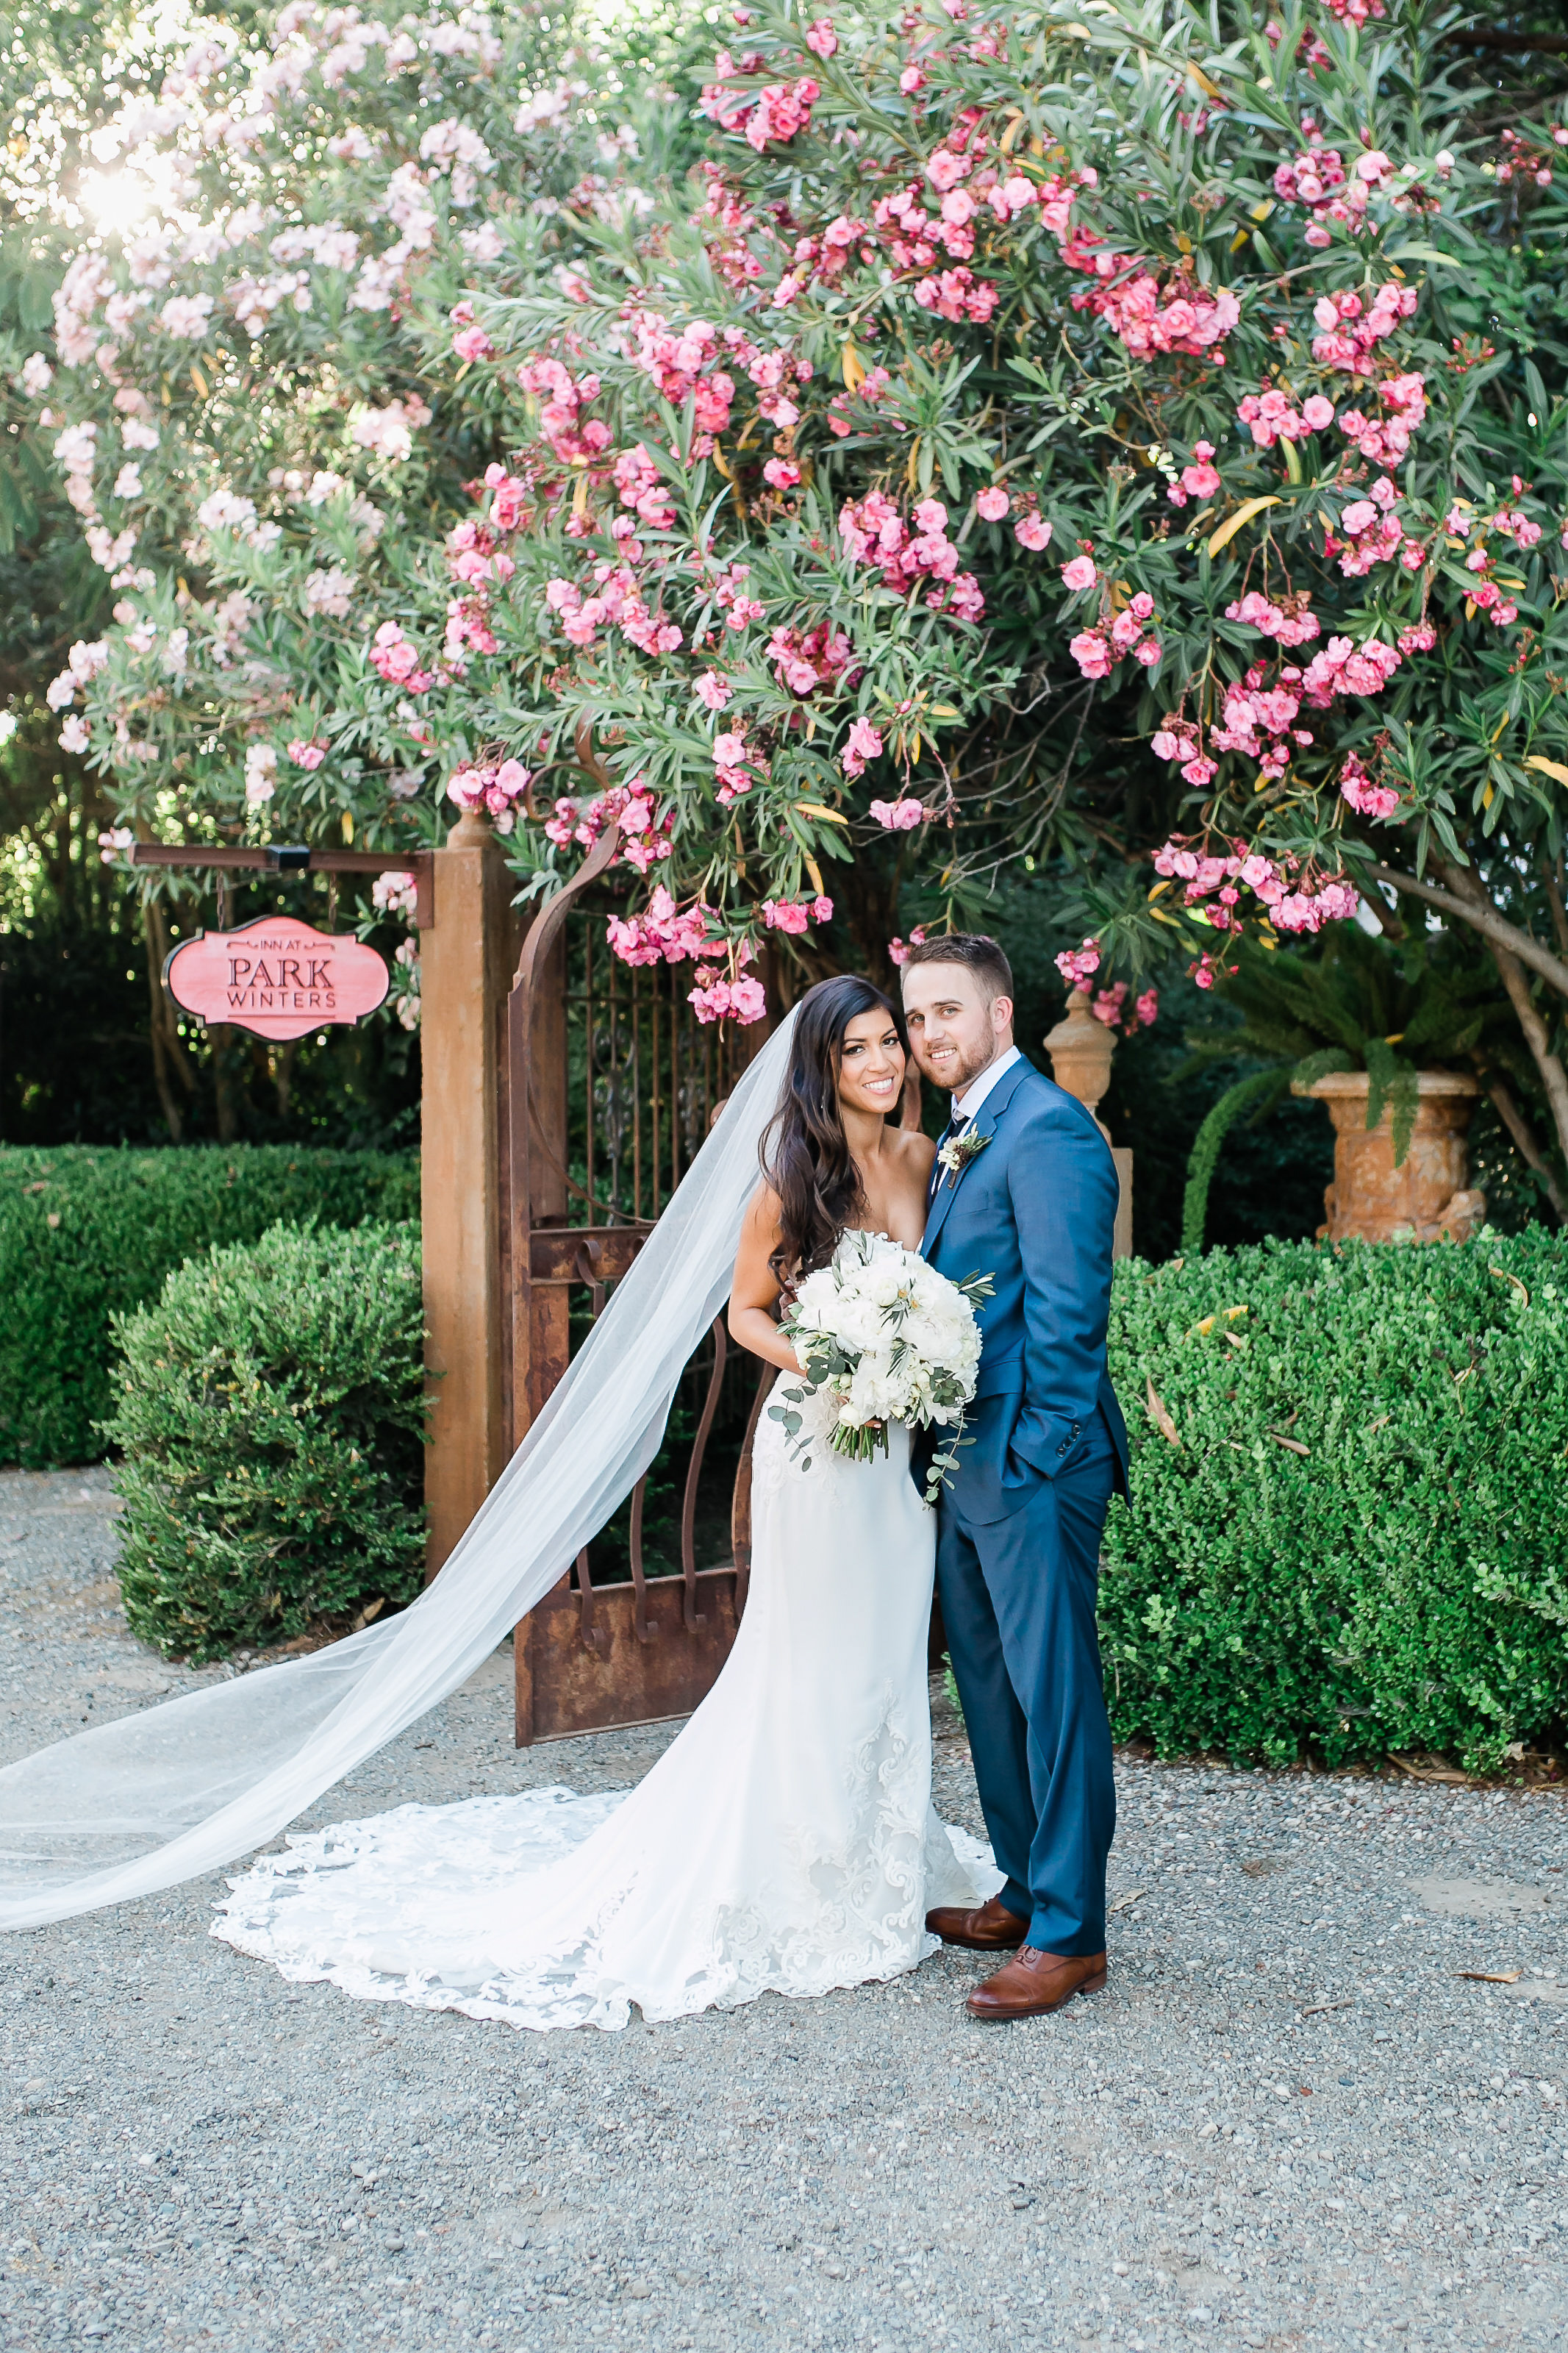 Park Winters Summer Wedding | Bride and Groom Photo